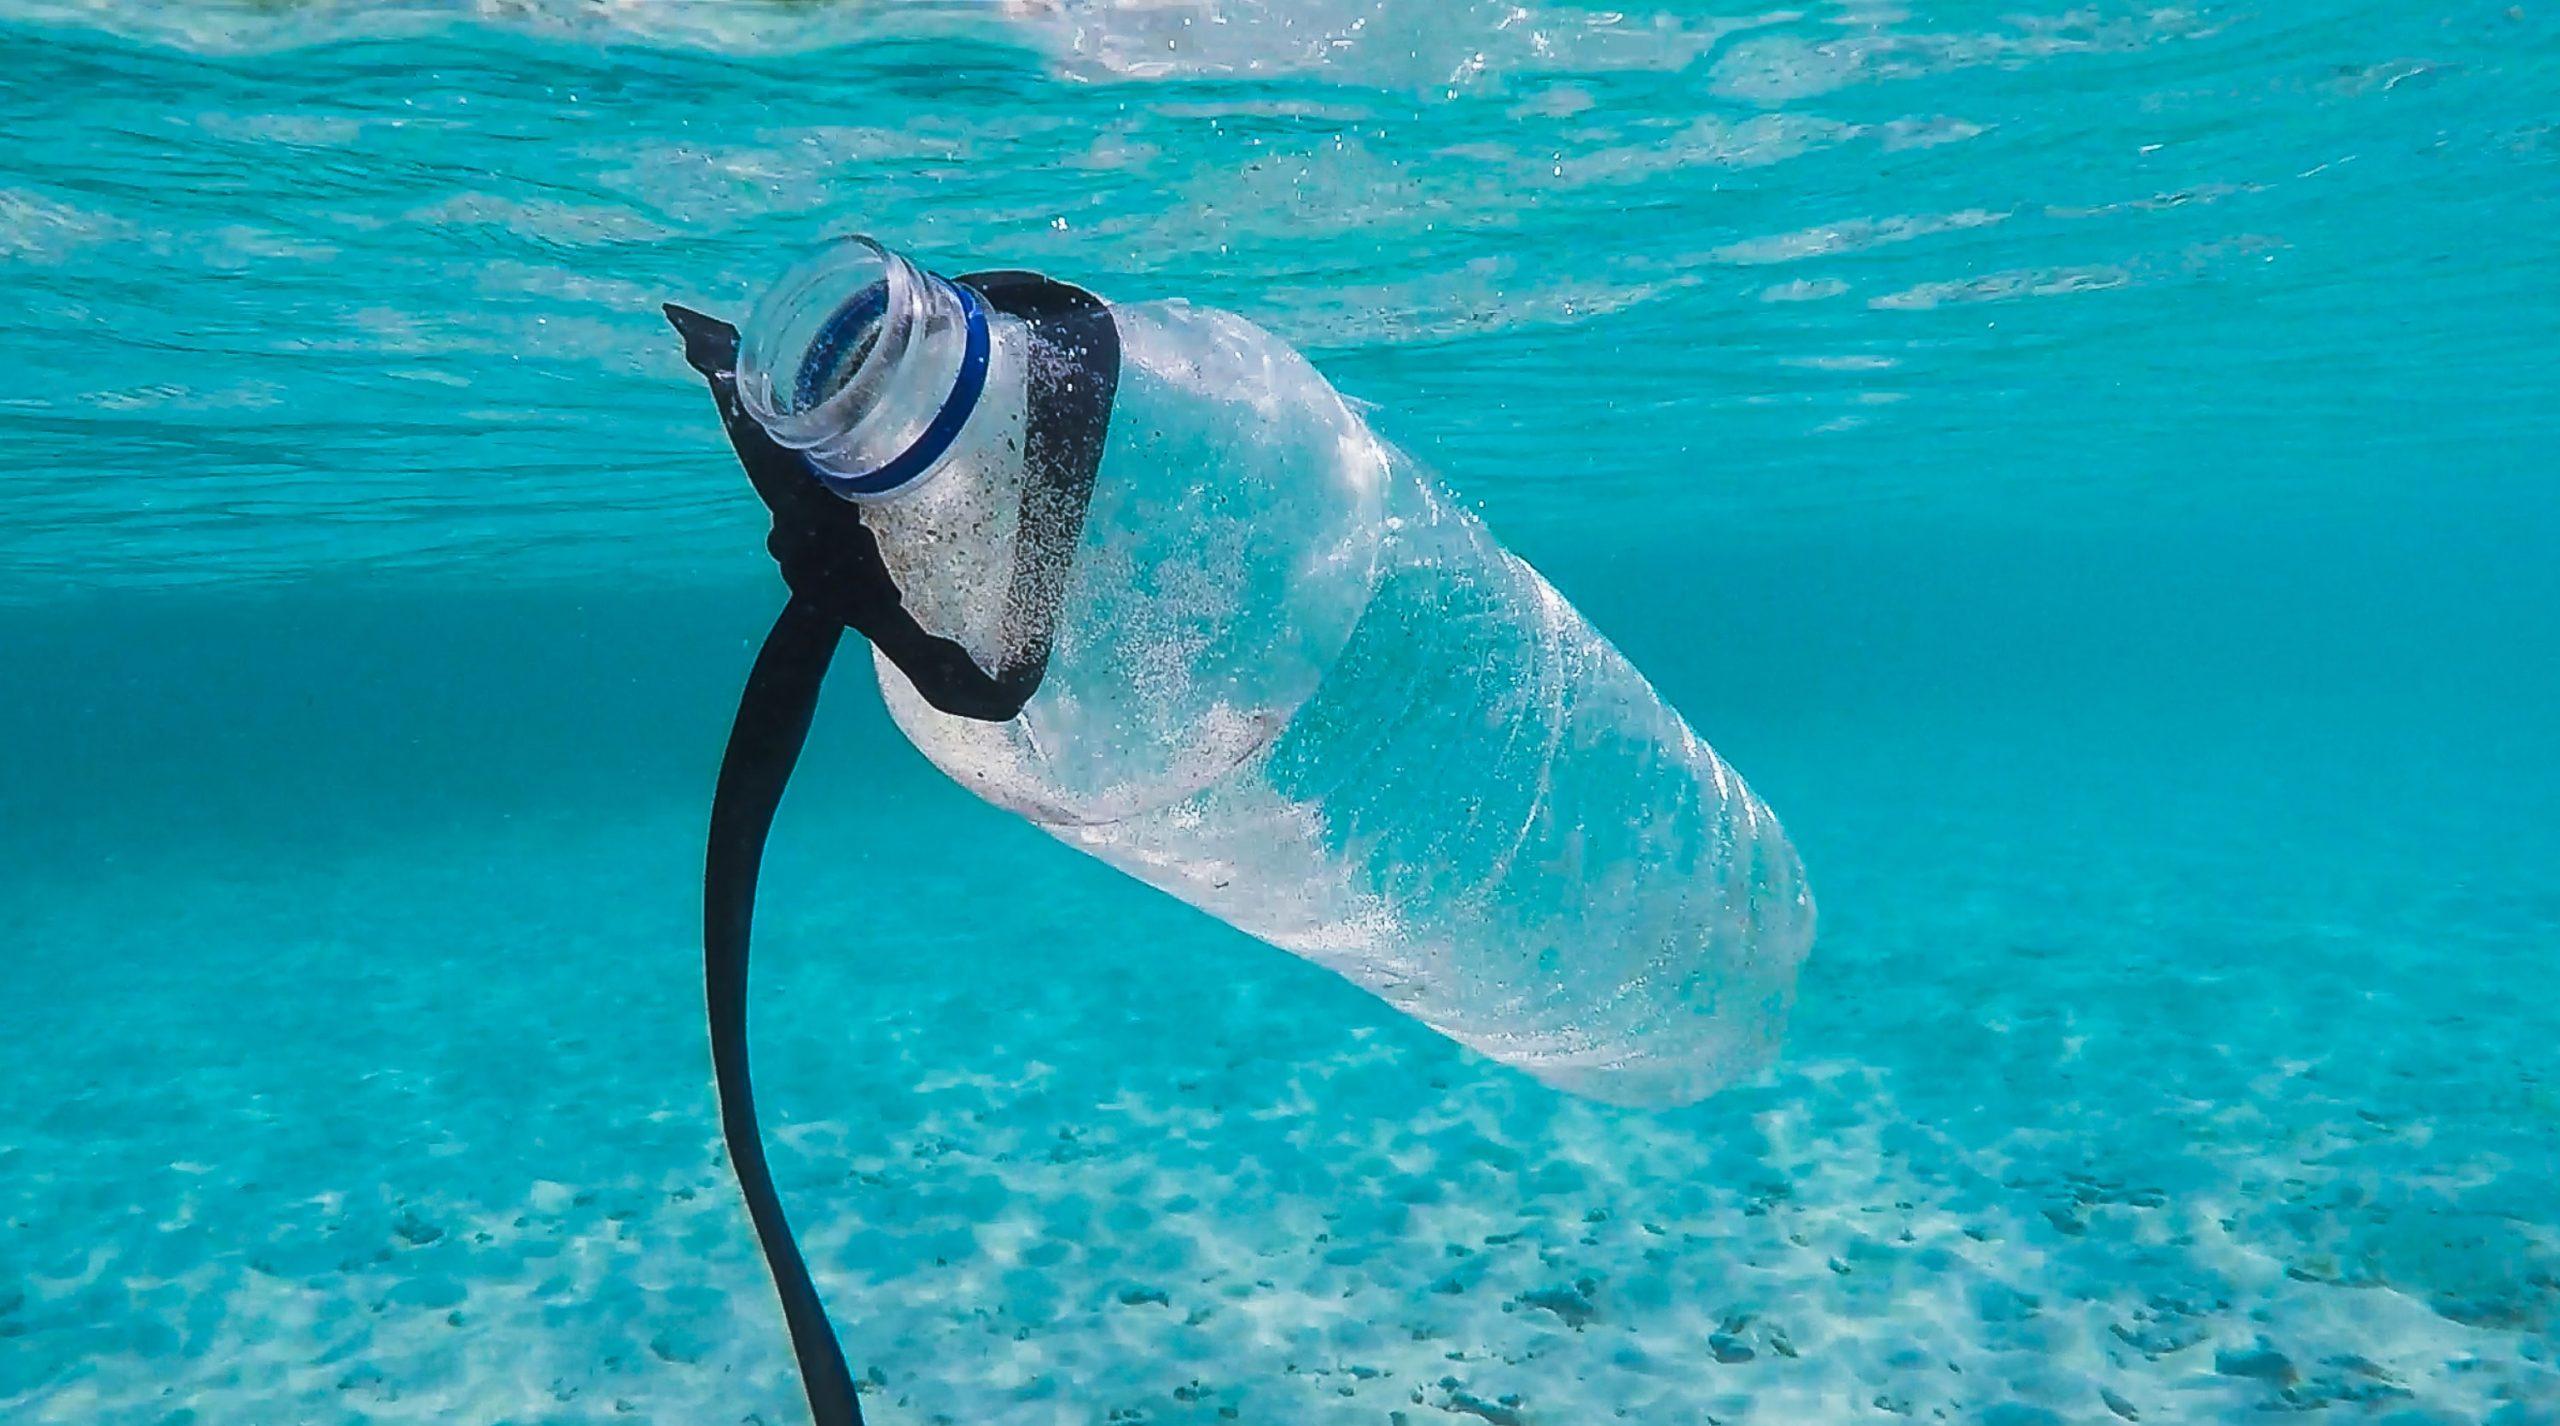 Plastic bottle floating in the ocean